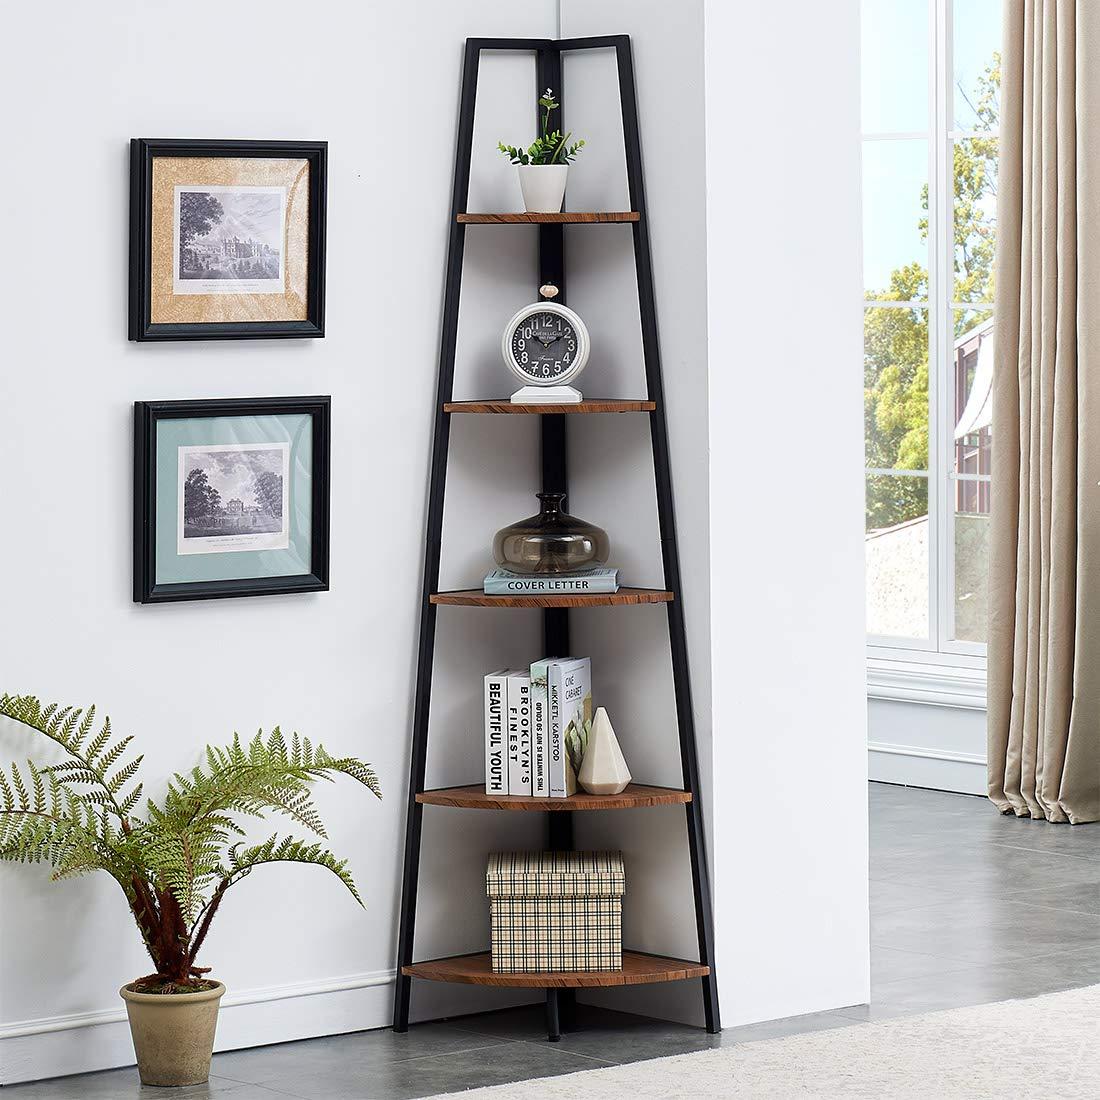 O&K FURNITURE Industrial Wood and Metal Corner Bookcase, 5 Tier Corner Display Unit Shelves, Brown Finish